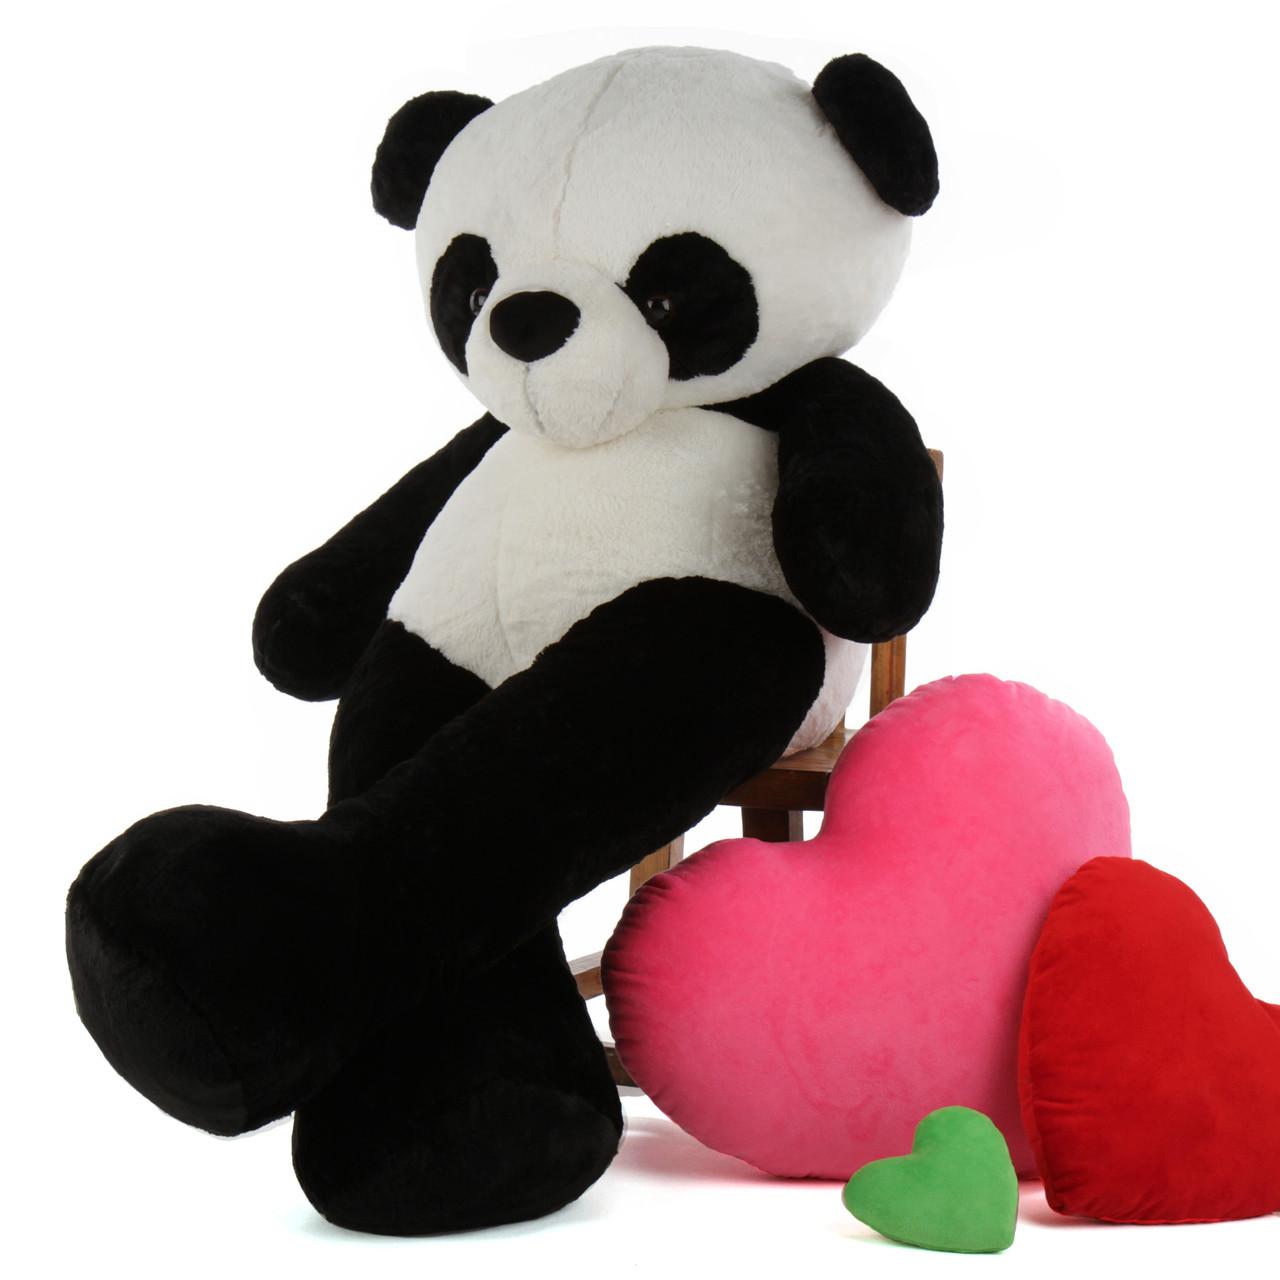 60in Huge Life Size Panda Teddy Bear Precious Xiong